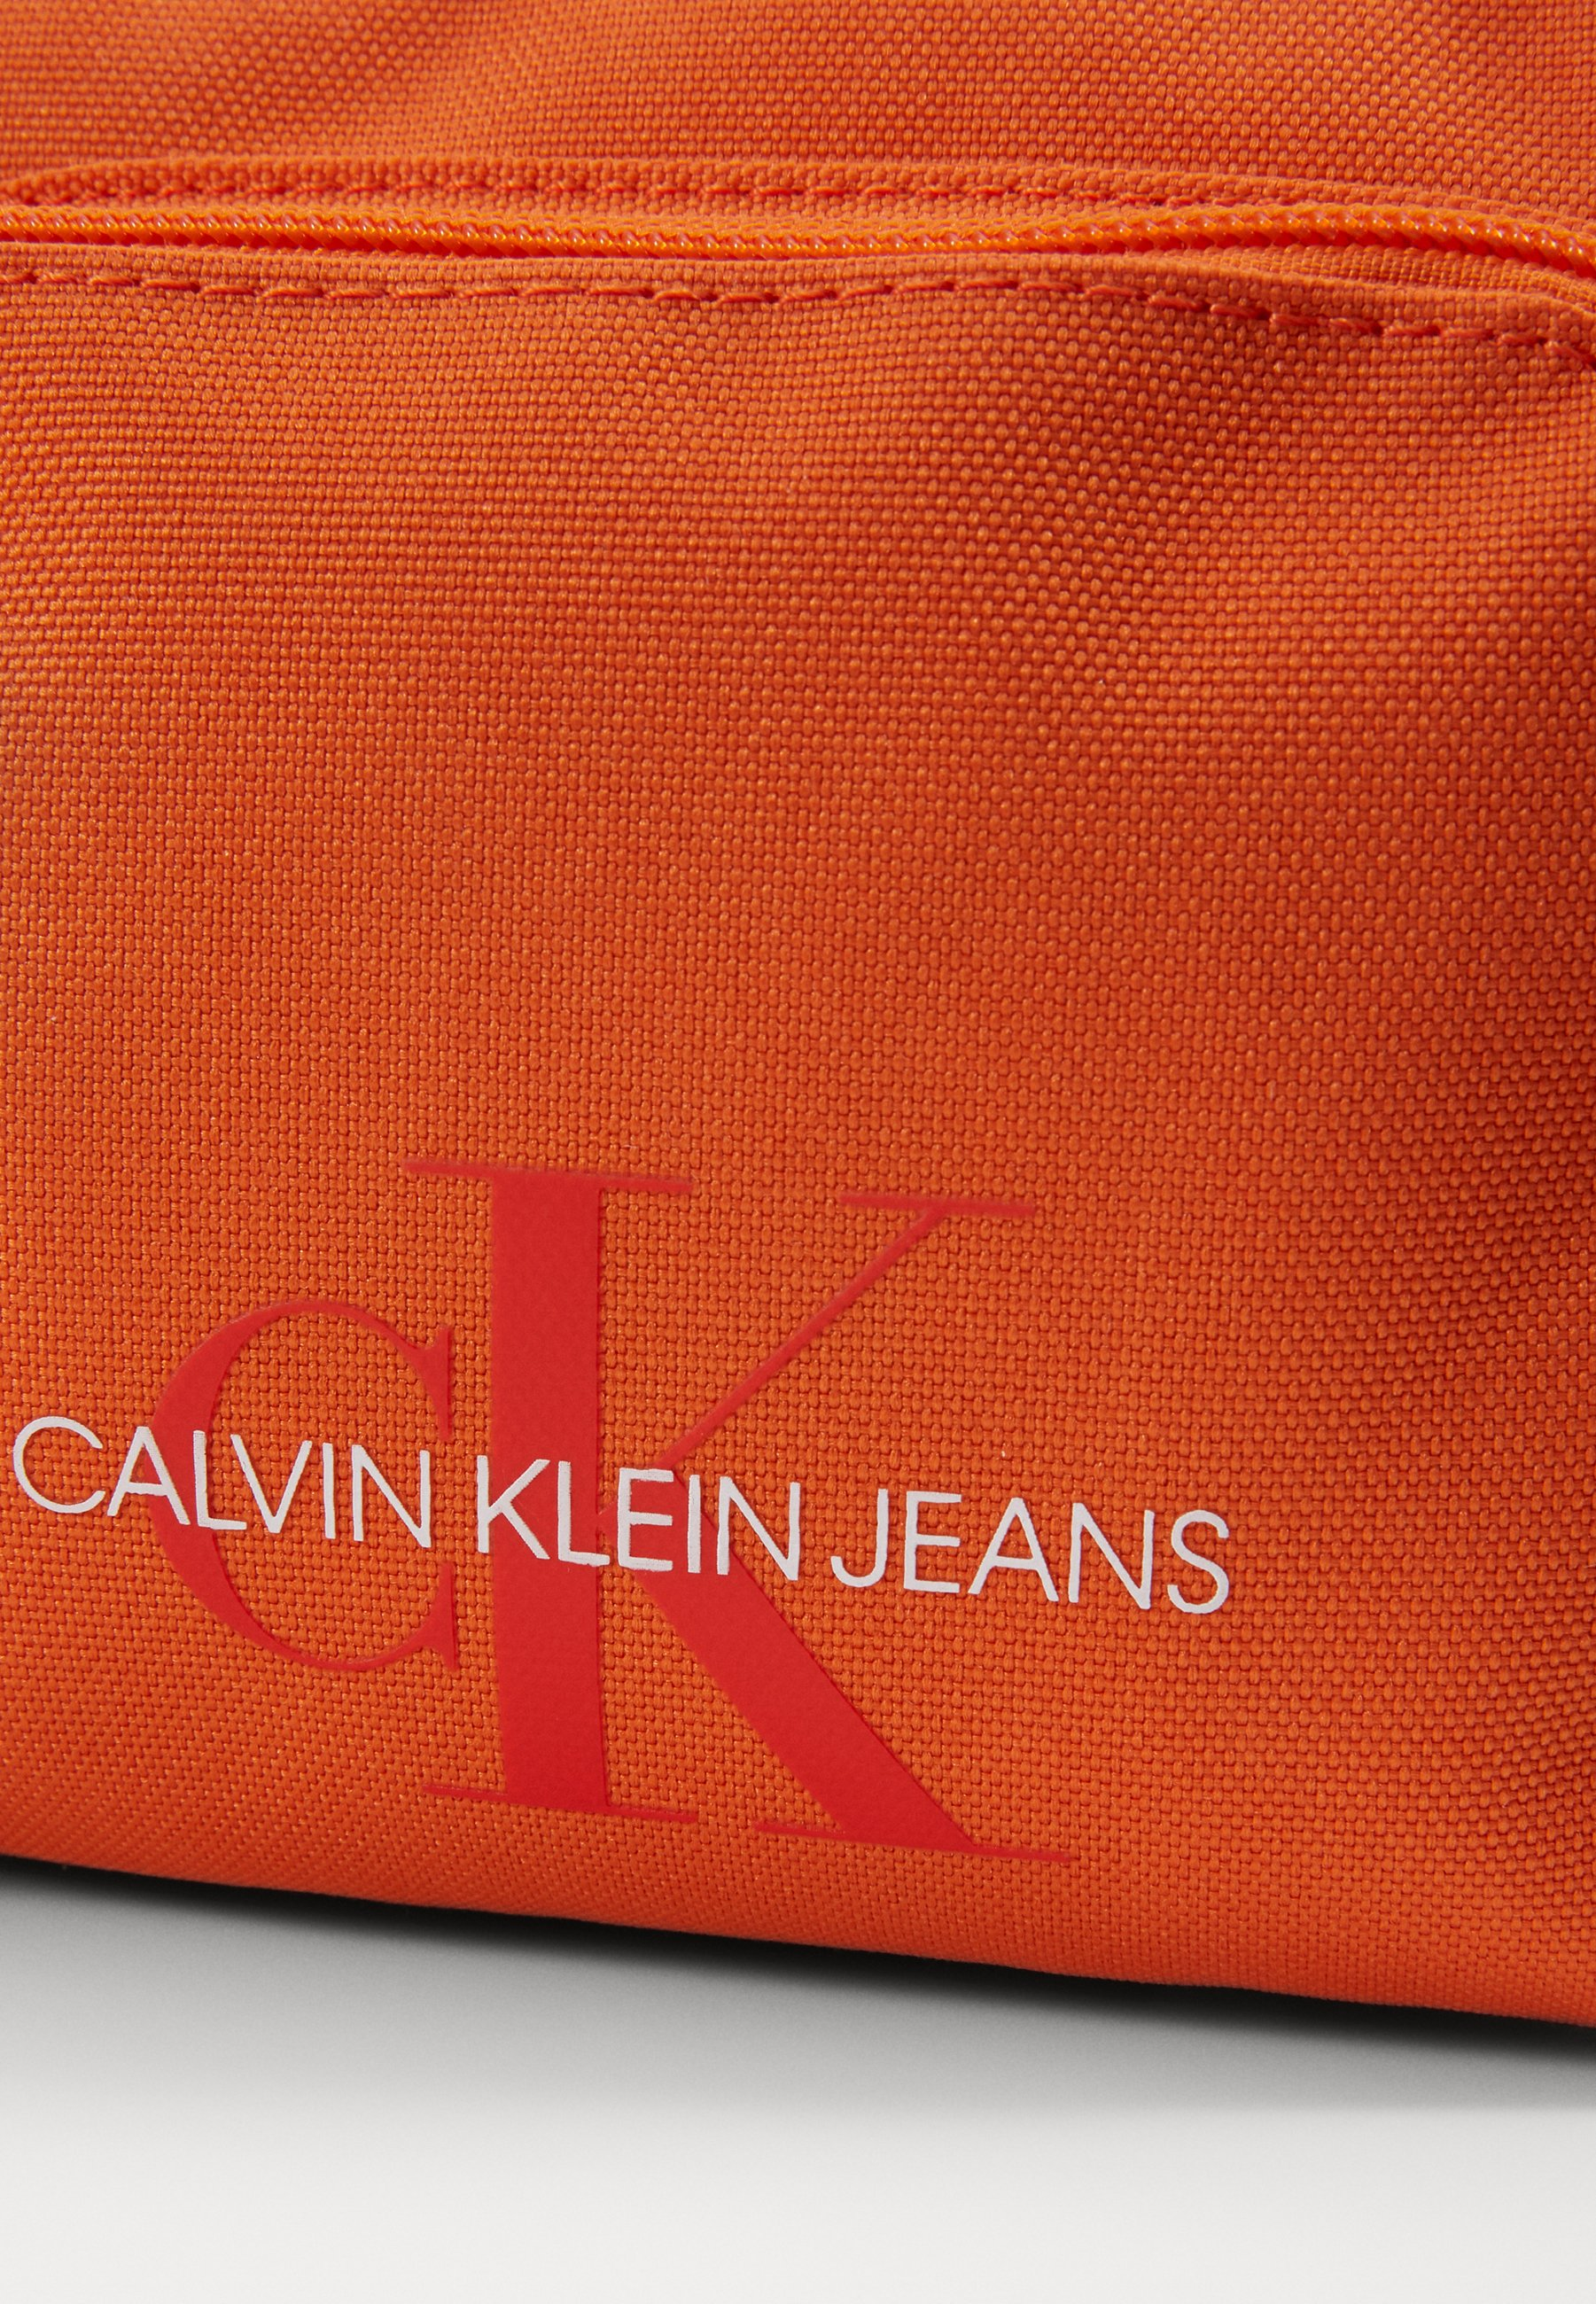 Calvin Klein Jeans Camera Bag - Torba Na Ramię Orange